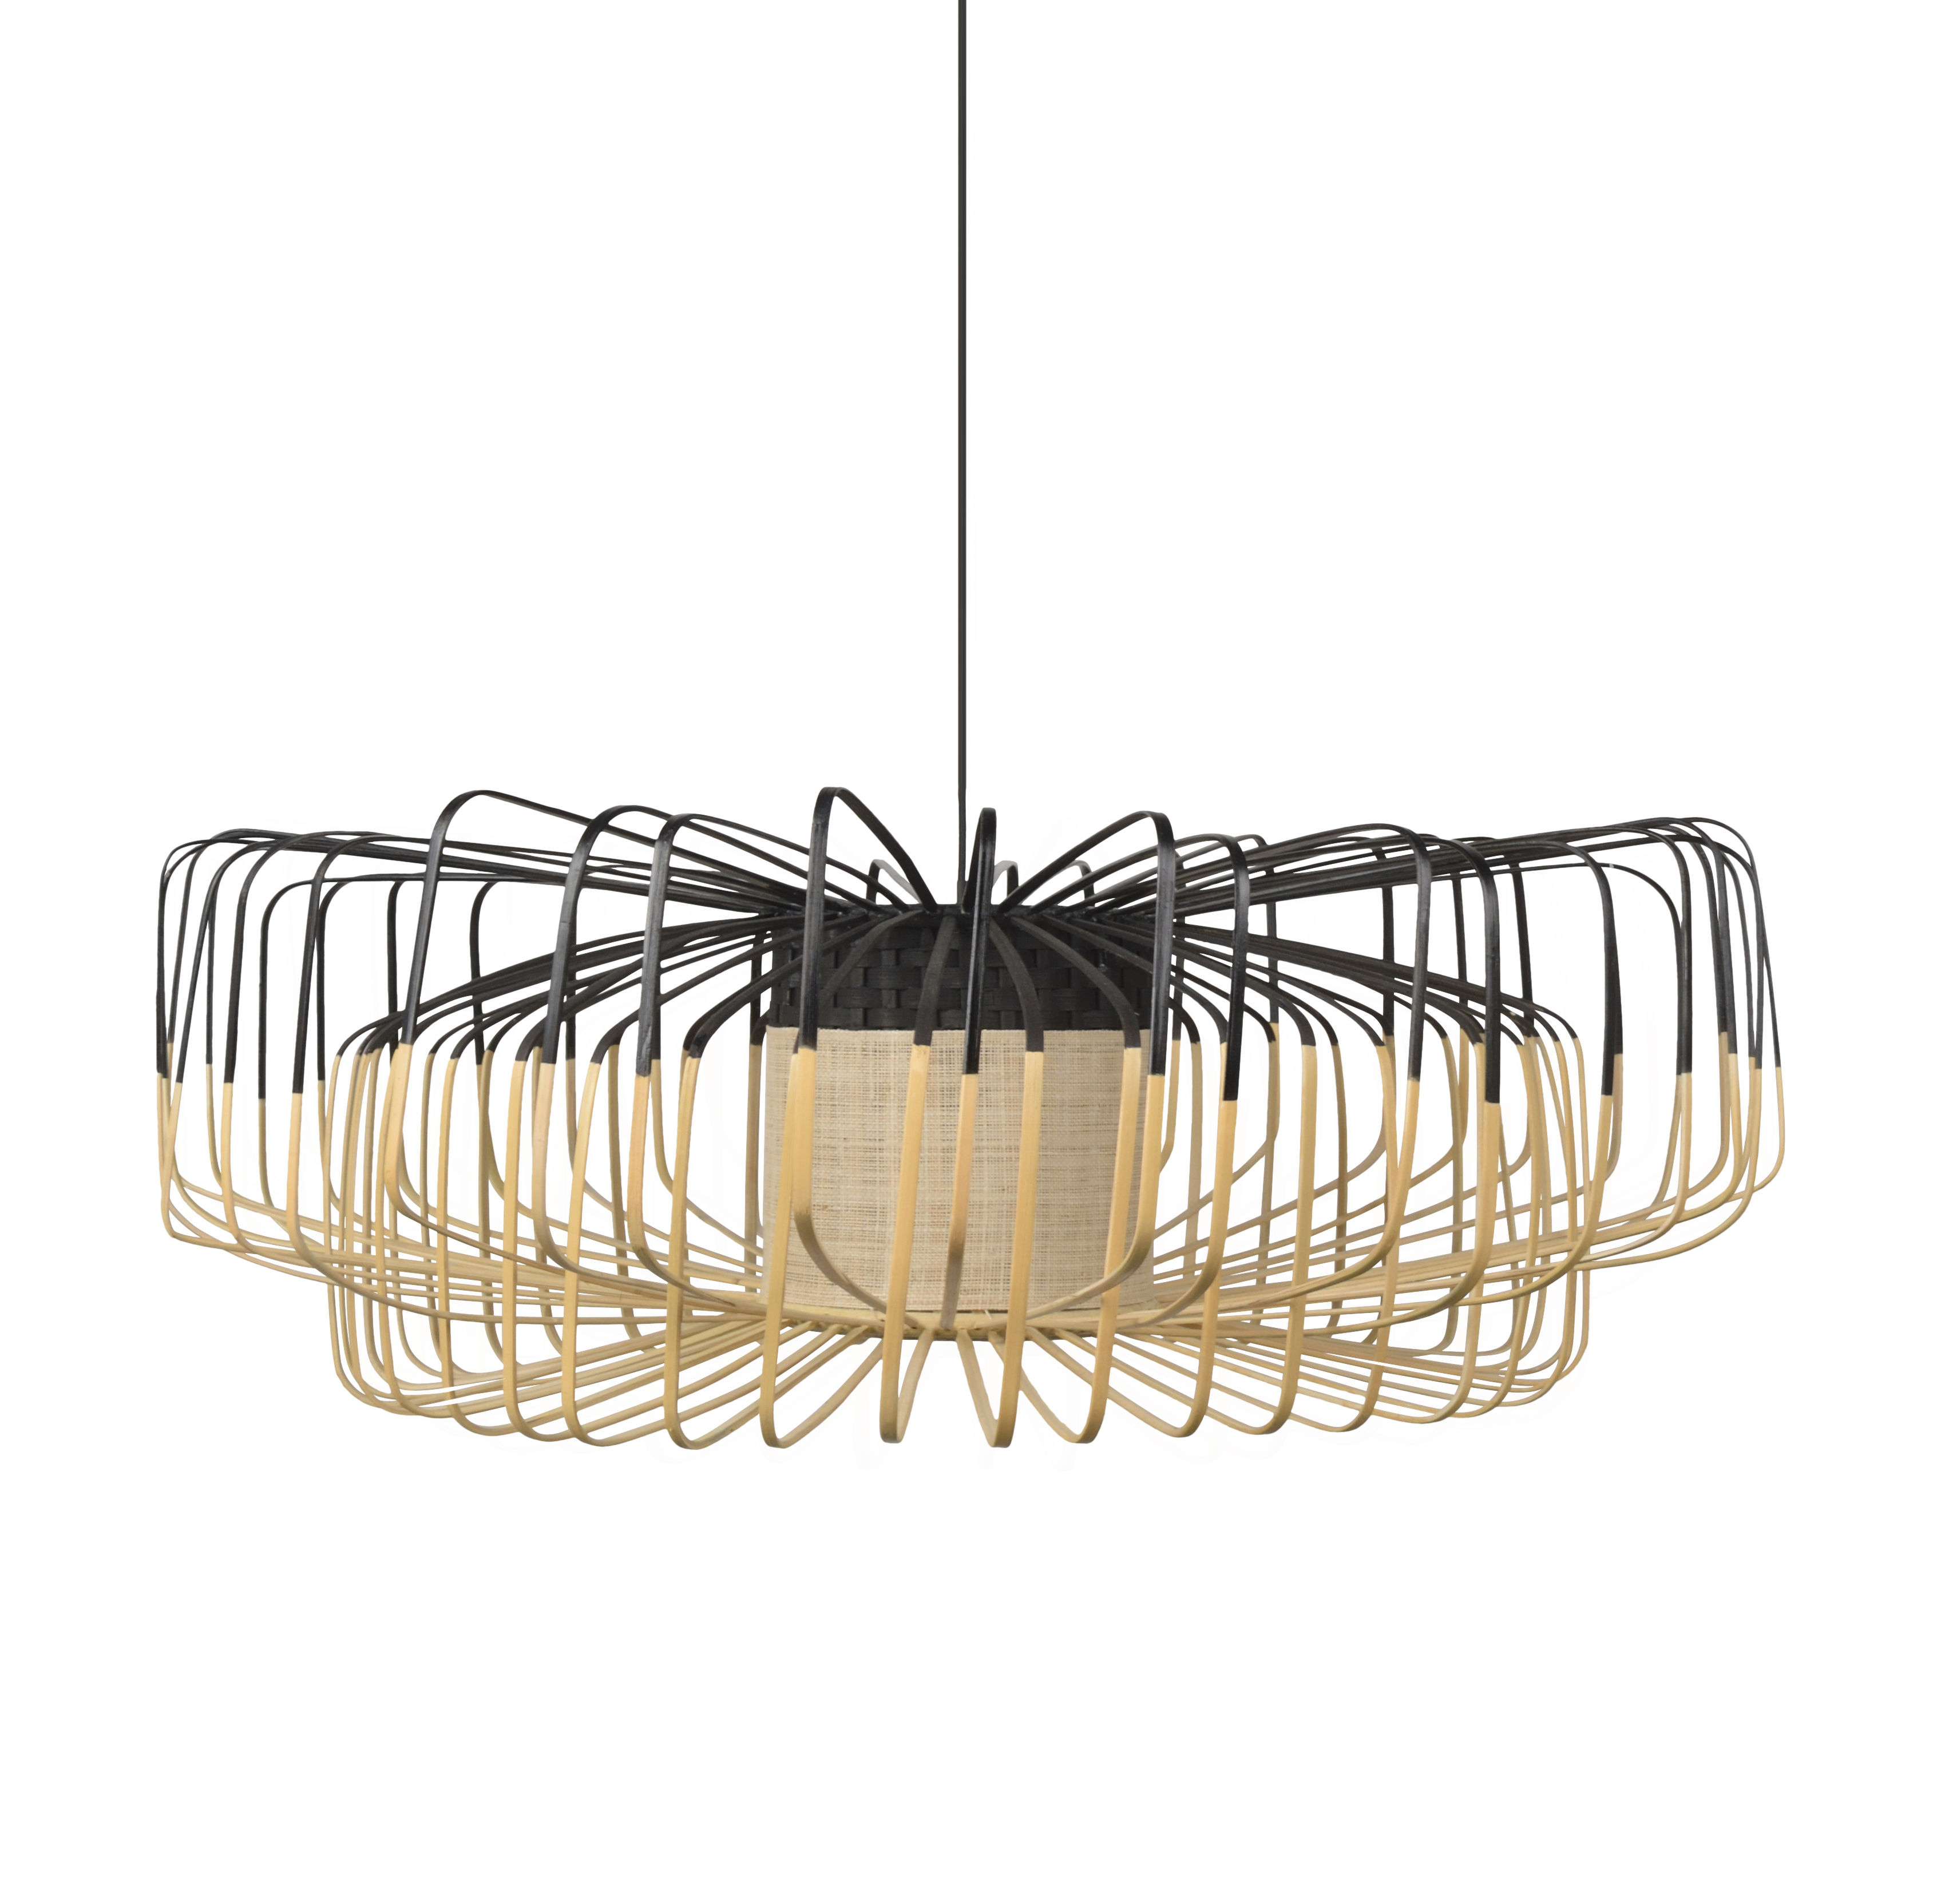 Luminaire - Suspensions - Suspension Bamboo Up-Down XXL / Ø 80 cm - Forestier - Noir - Bambou